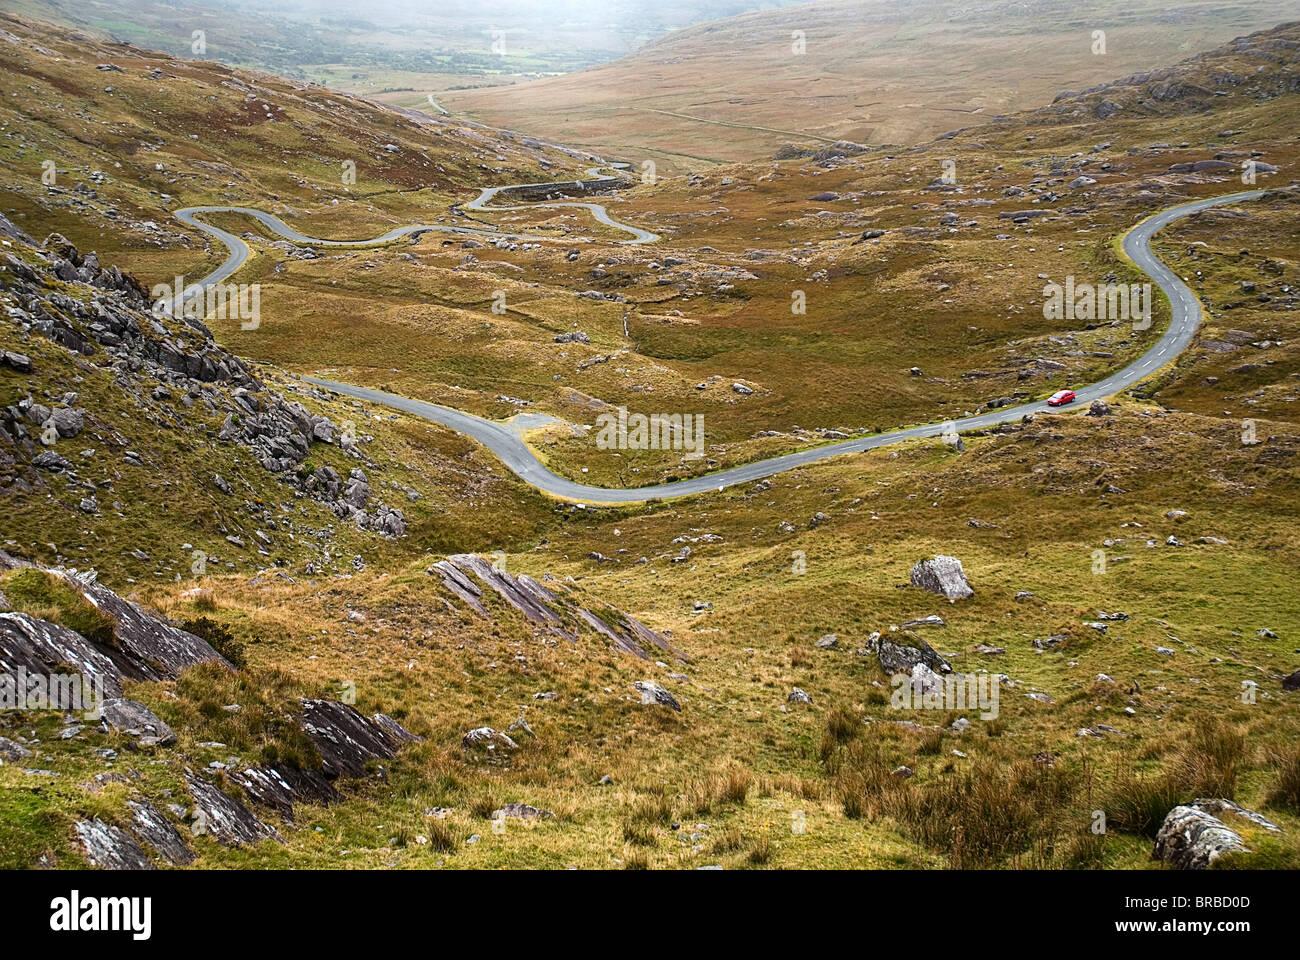 IRELAND County Cork The Tim Healy Pass - Stock Image